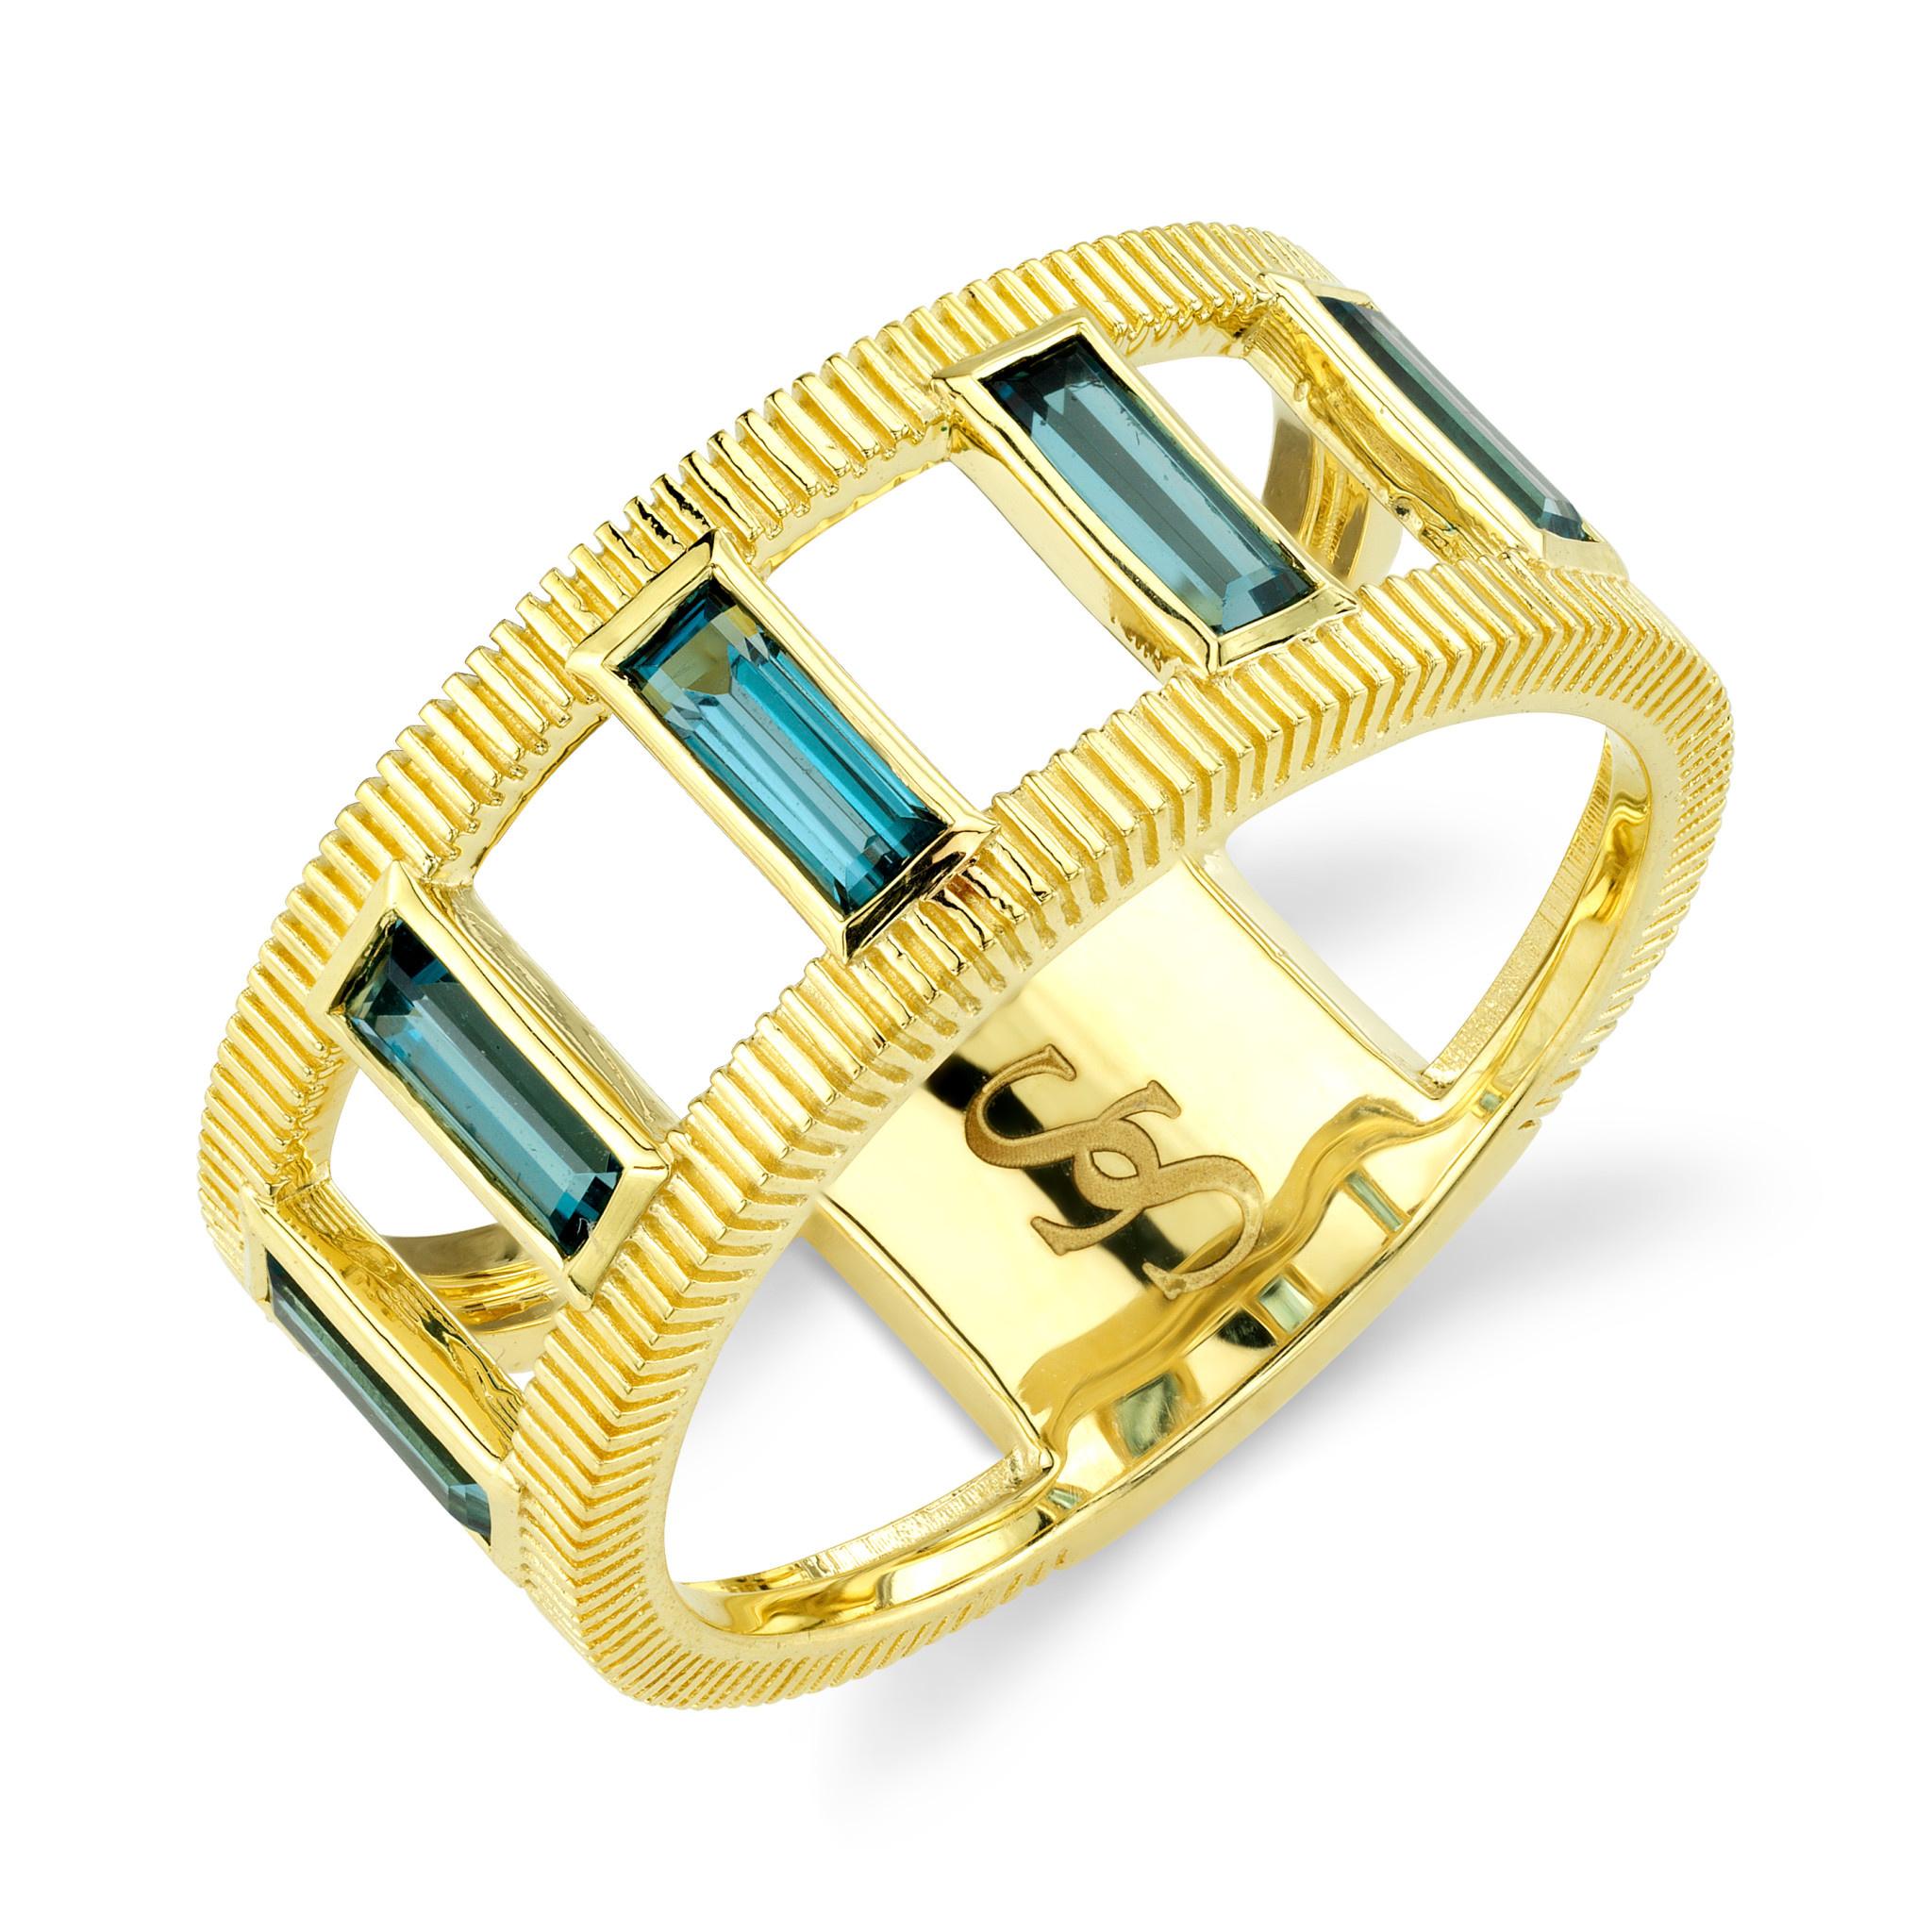 Emerald Cut London Blue Topaz Ring